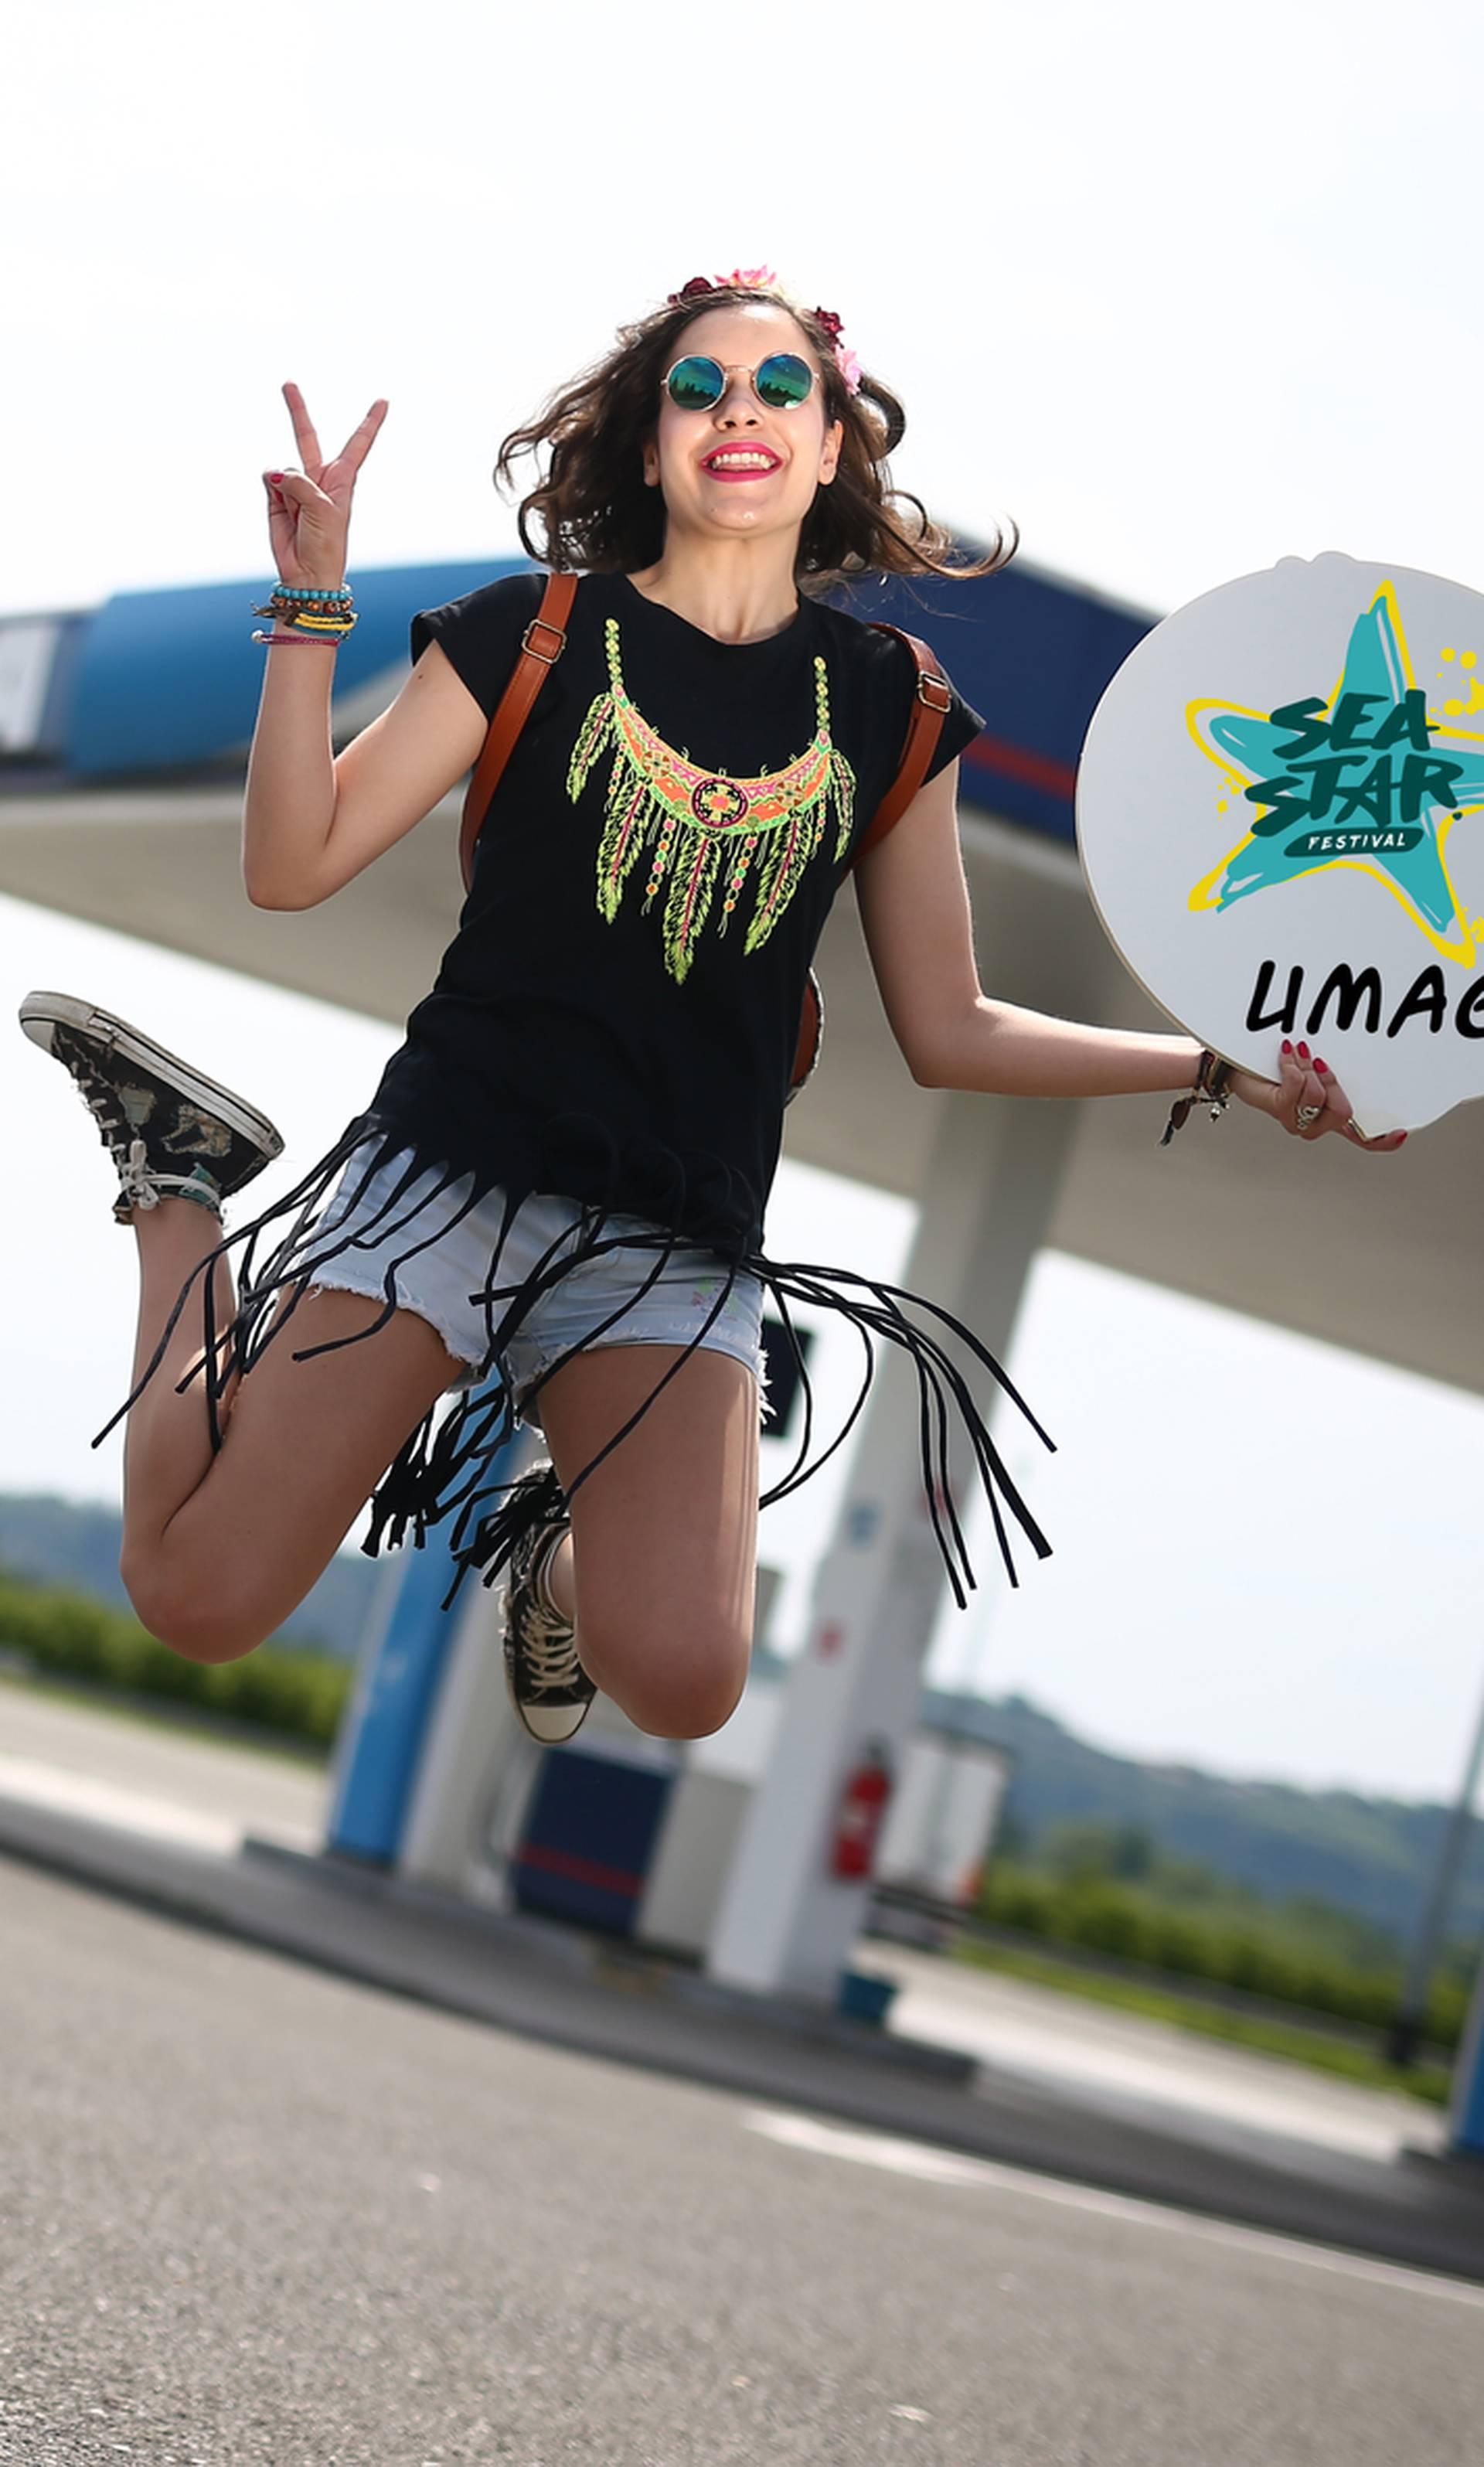 Sea Star Festival i INA: partneri za dobar festival